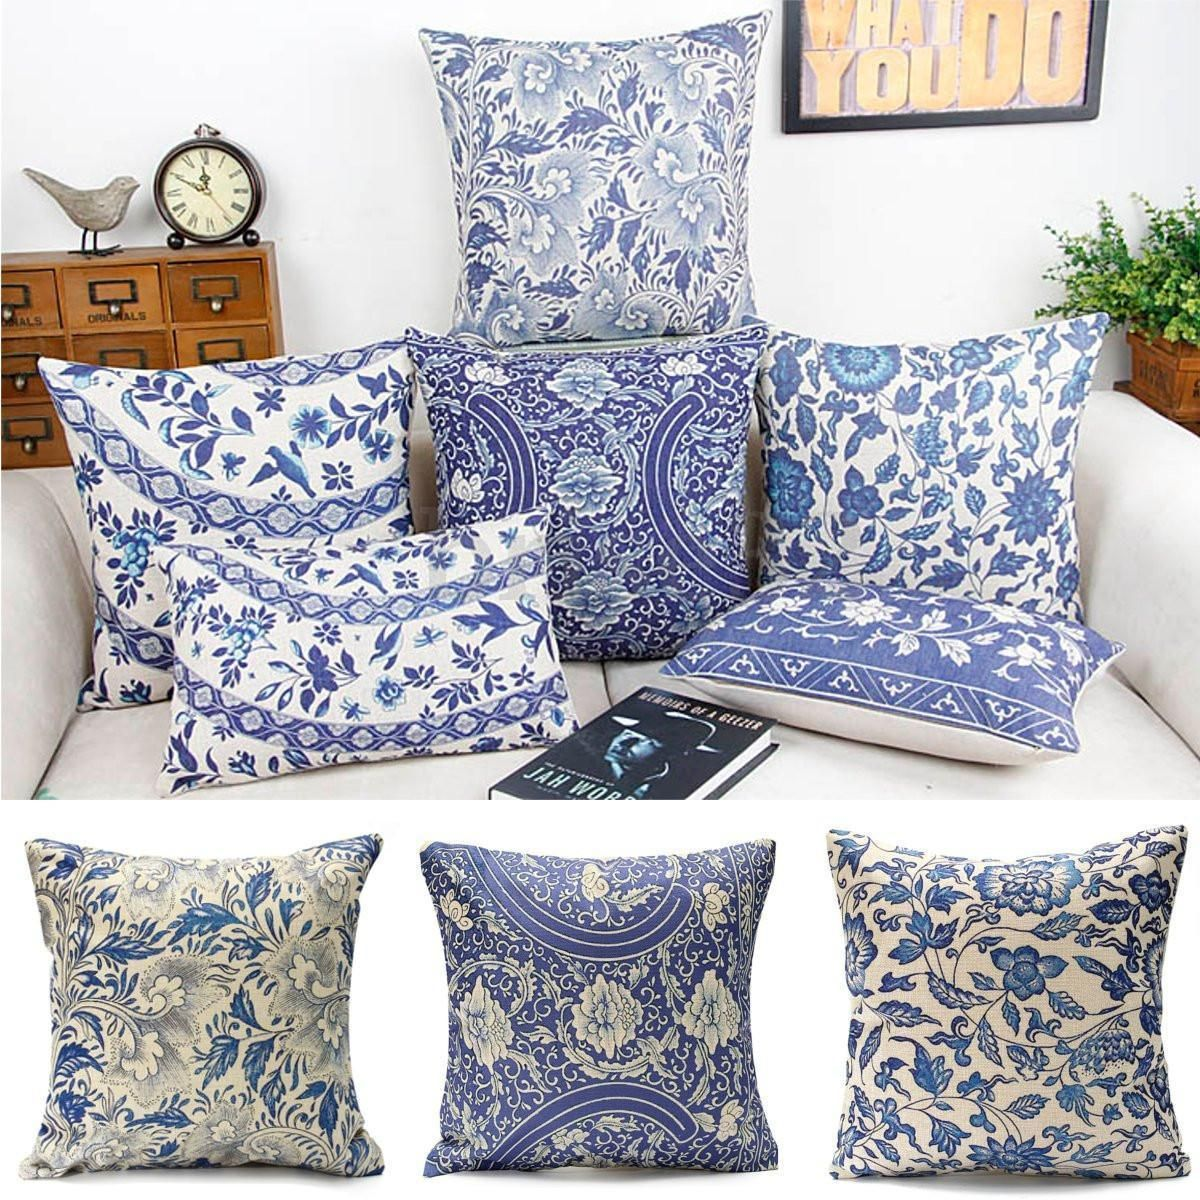 Find Great Deals For Vintage Oriental Blue Floral Cotton Linen Cushion Cover Pillow Case Home Decor Shop With Confidence On Ebay Sofa Decor